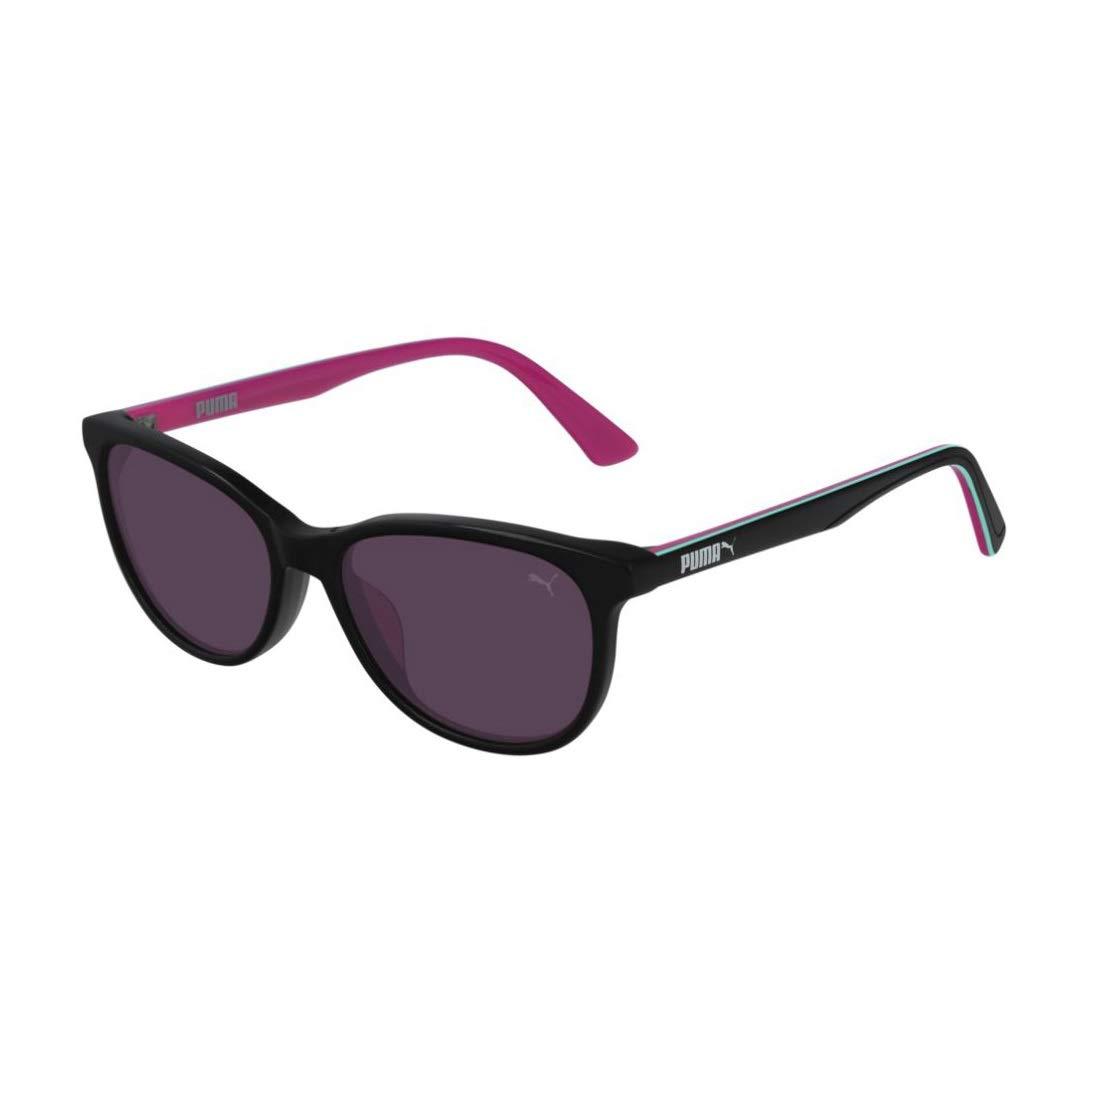 Puma Junior Gafas de sol, Negro (Black/Black/Violet), 47.0 ...